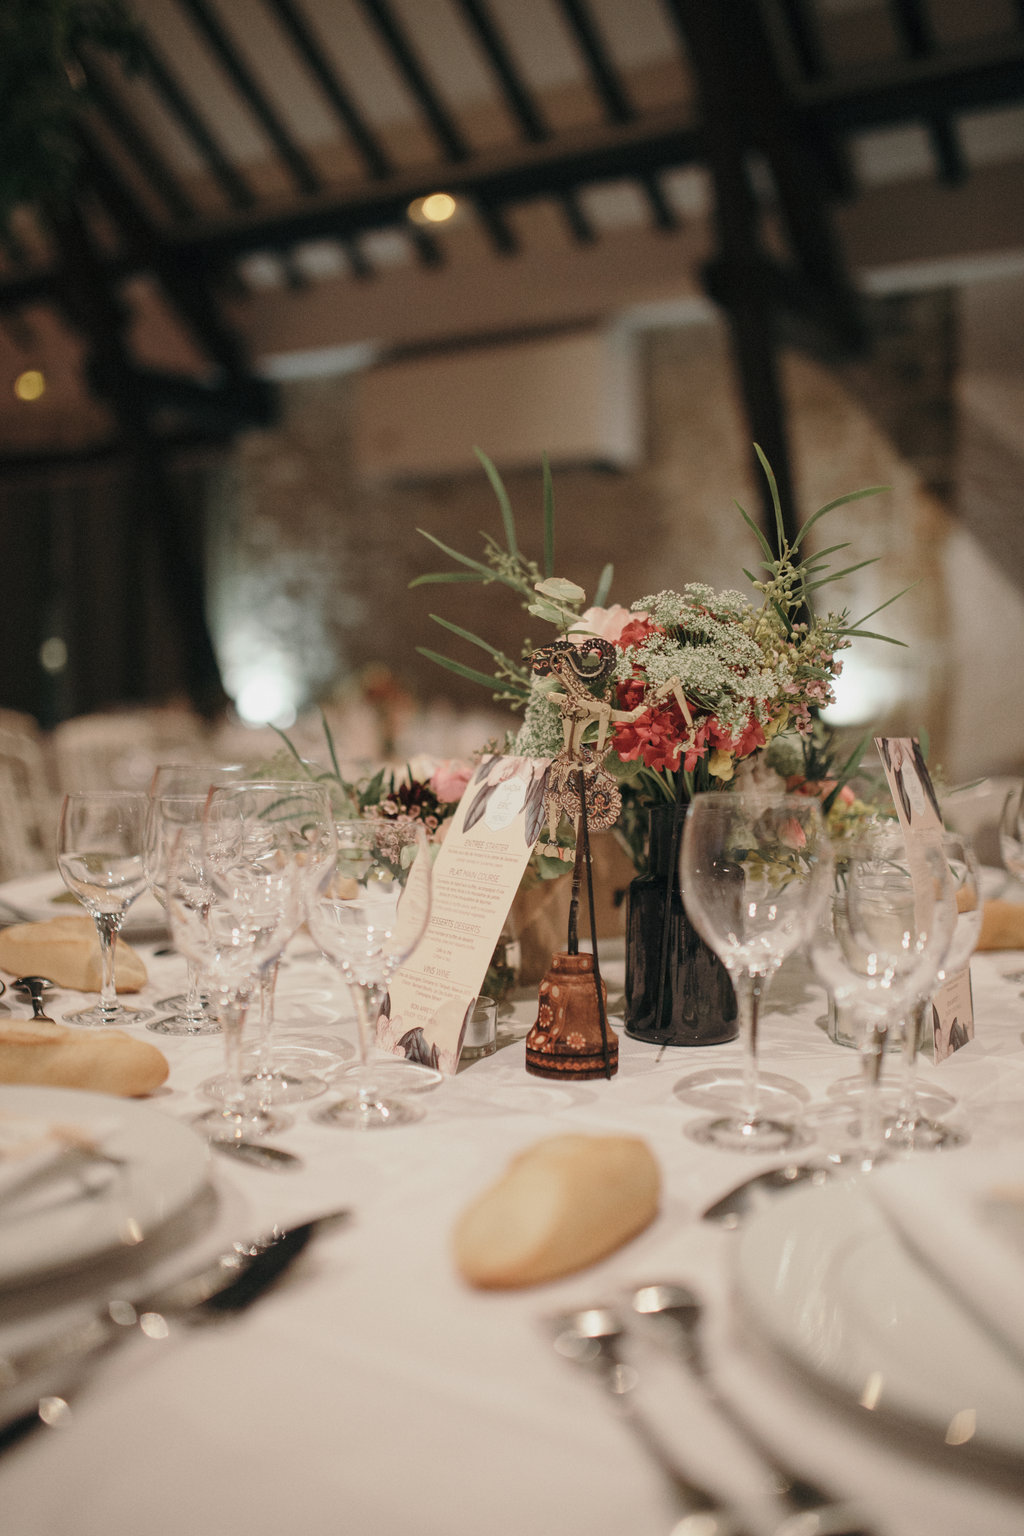 sebastienboudot-wedding-photographer-nadia-eric-431